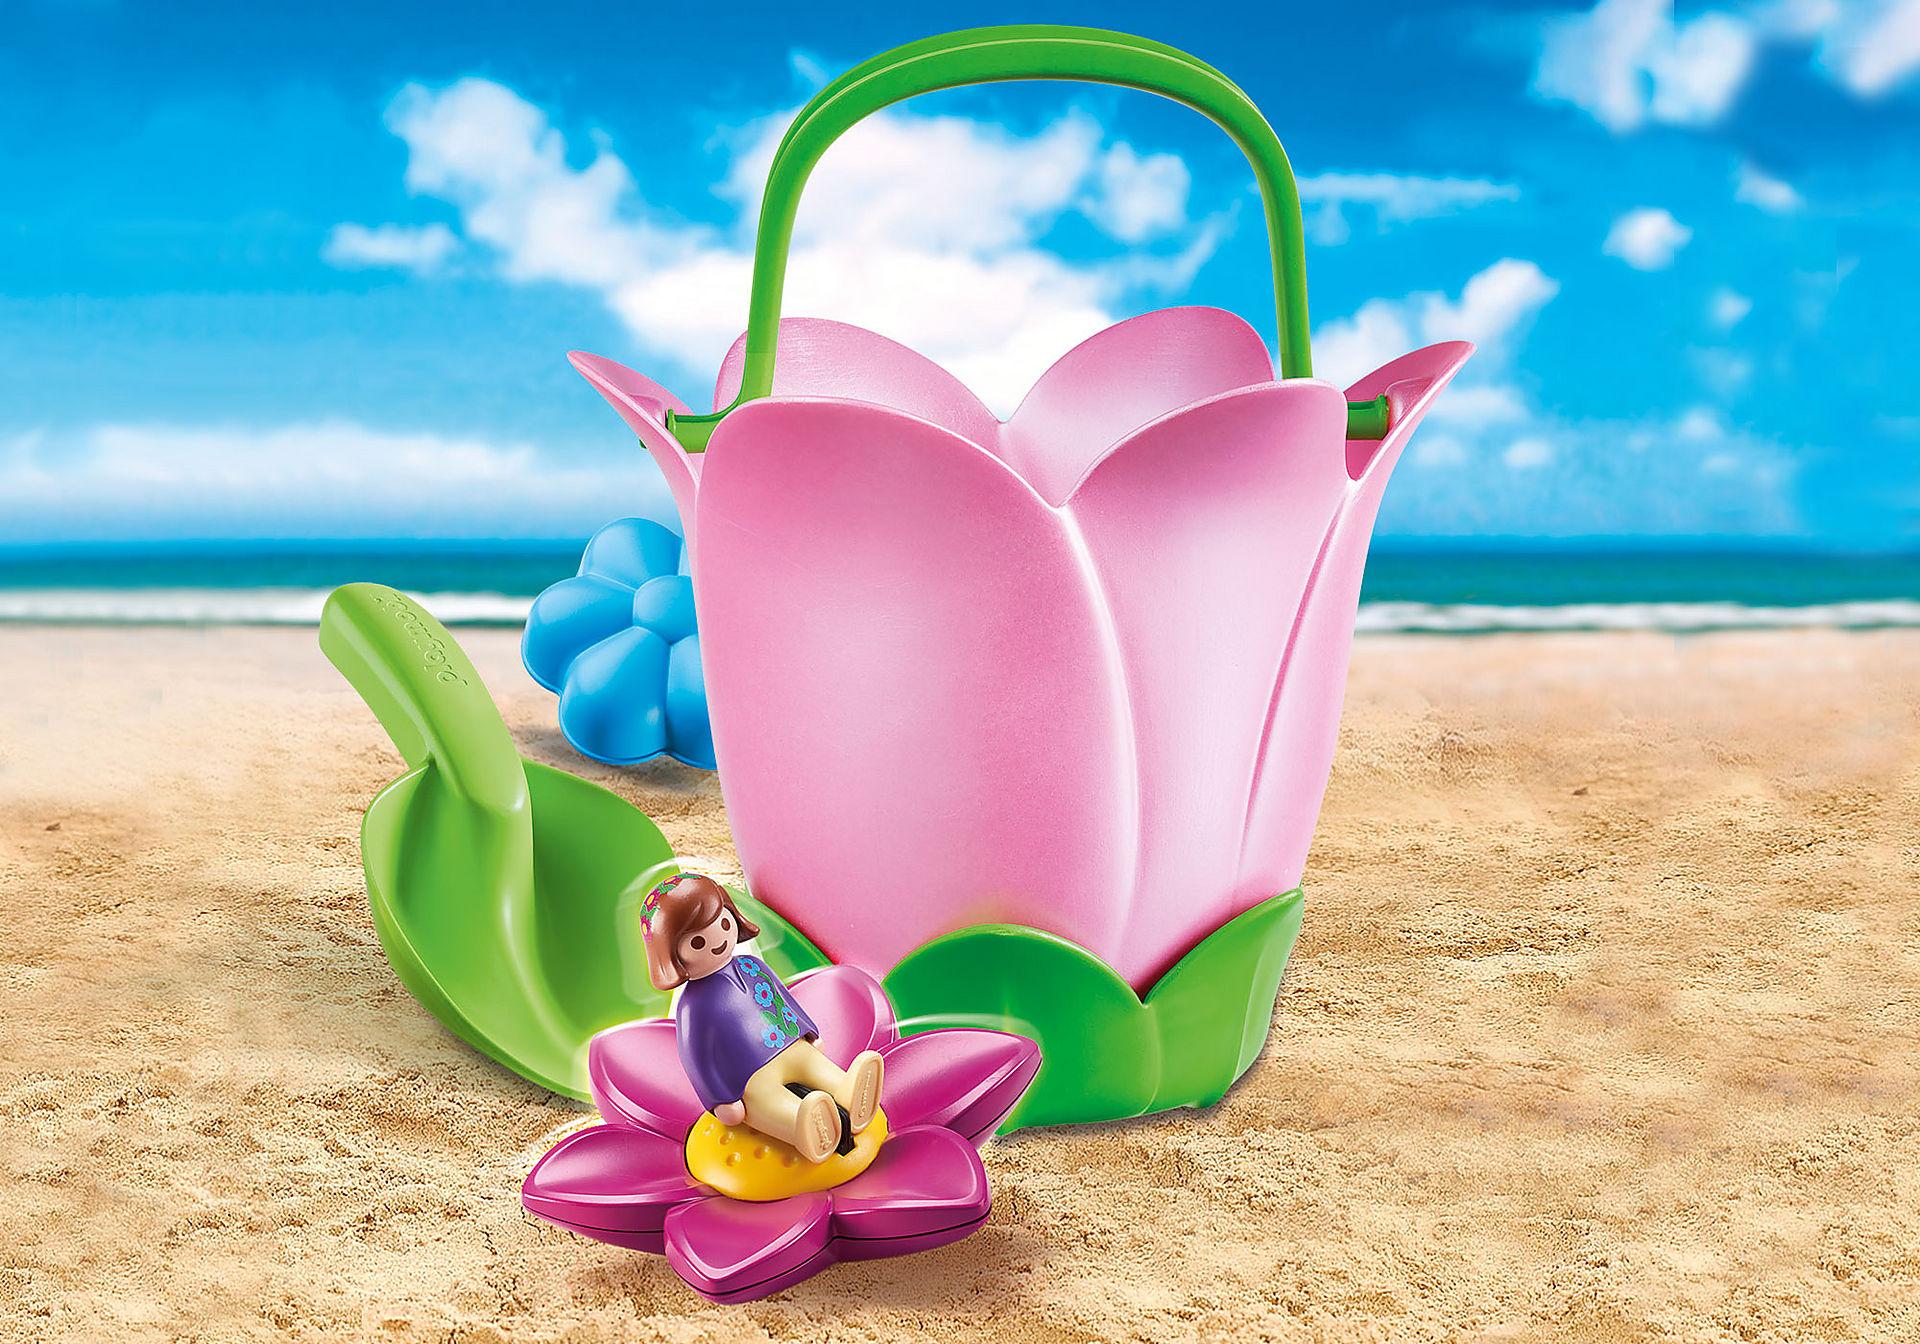 70065 Seau floral zoom image1